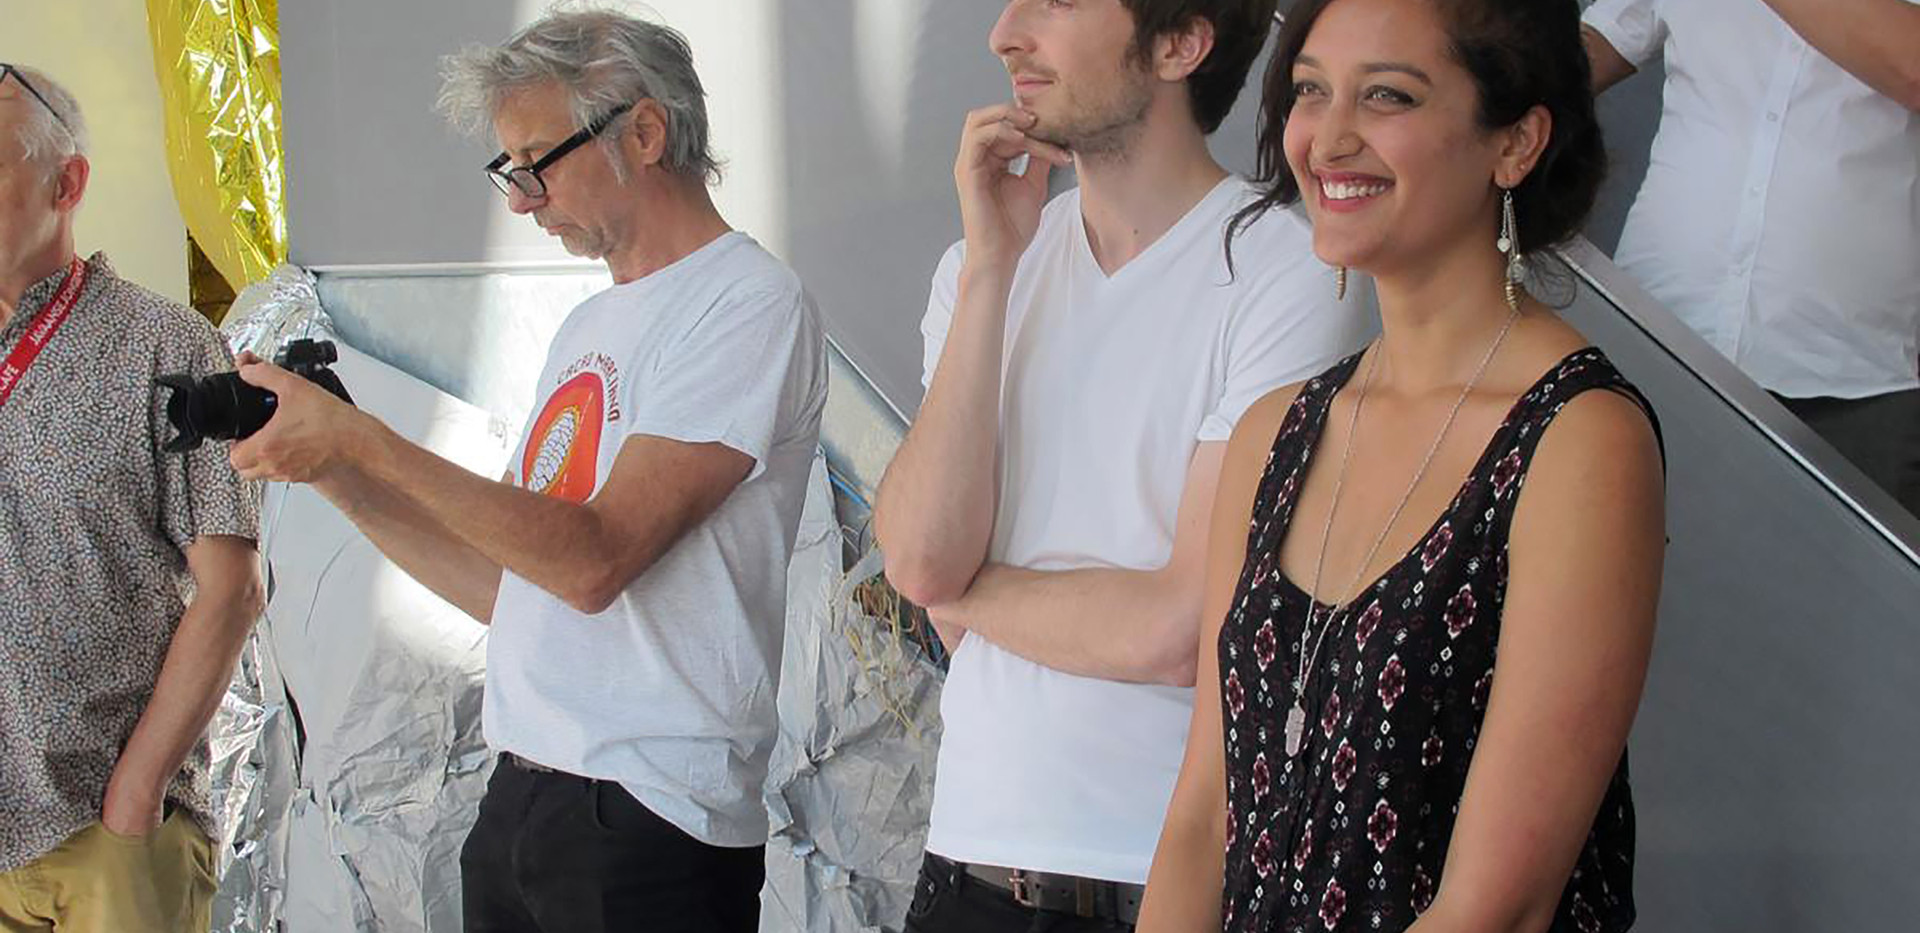 Expo curator Biek van Bree; artist Tanya Gupta